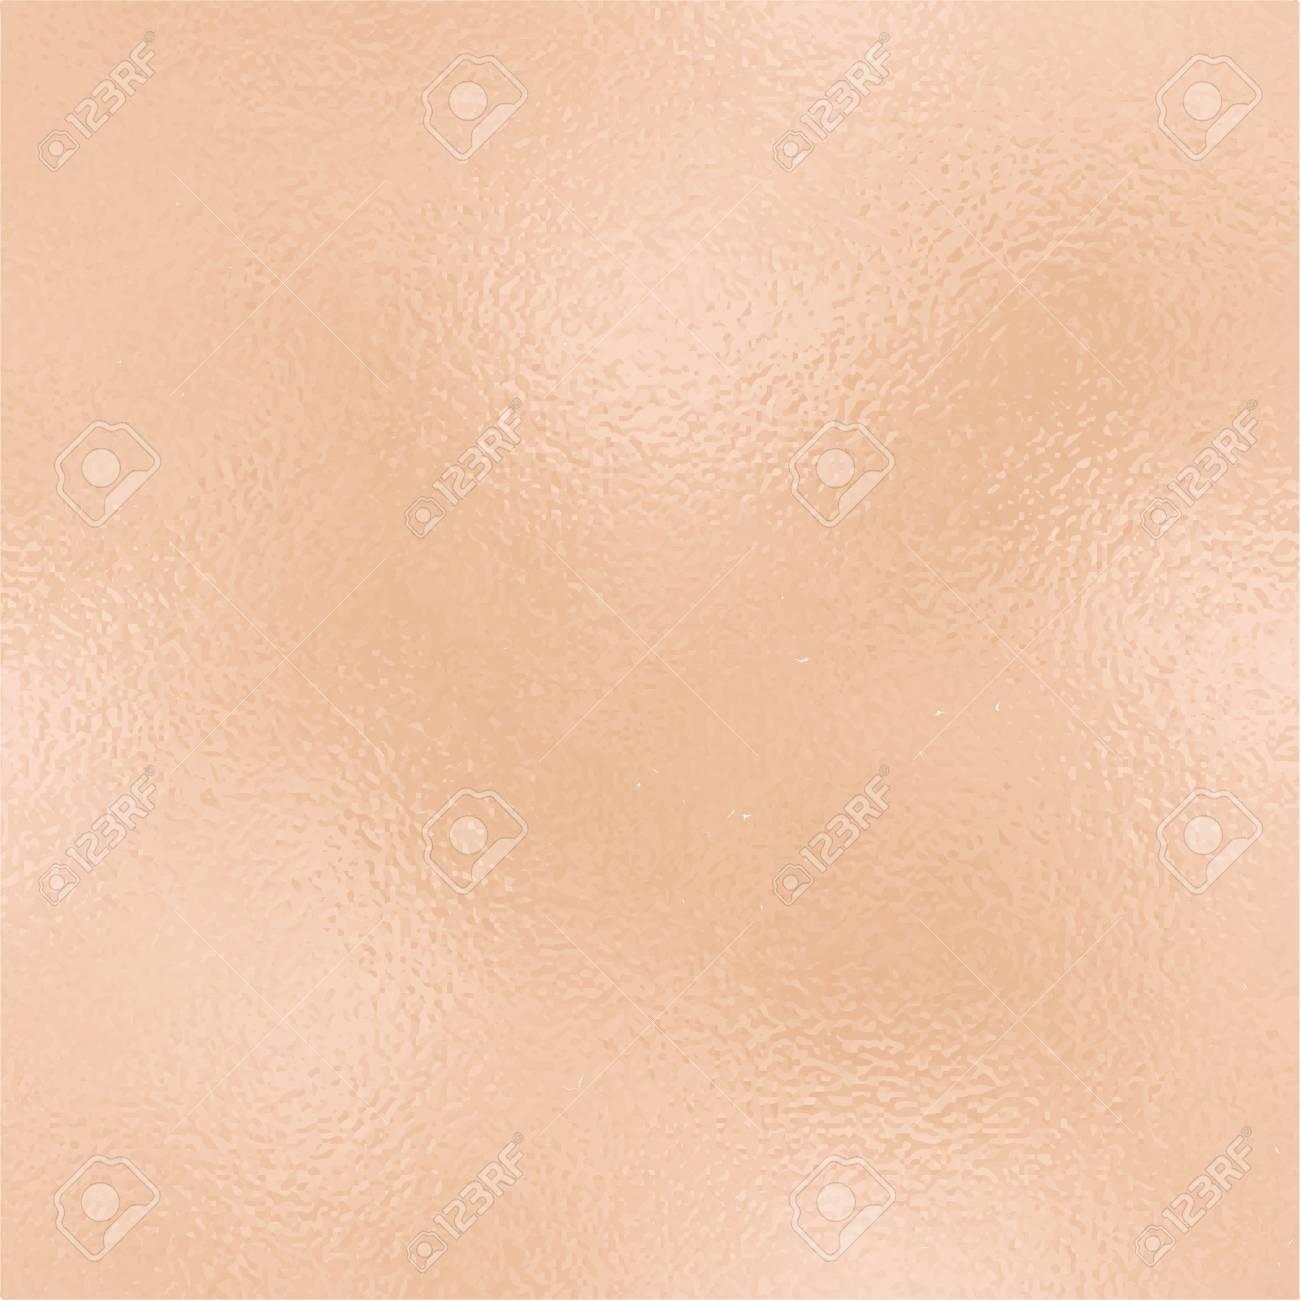 Metallic Golden Foil Texture Rose Gold Foil Square Vector